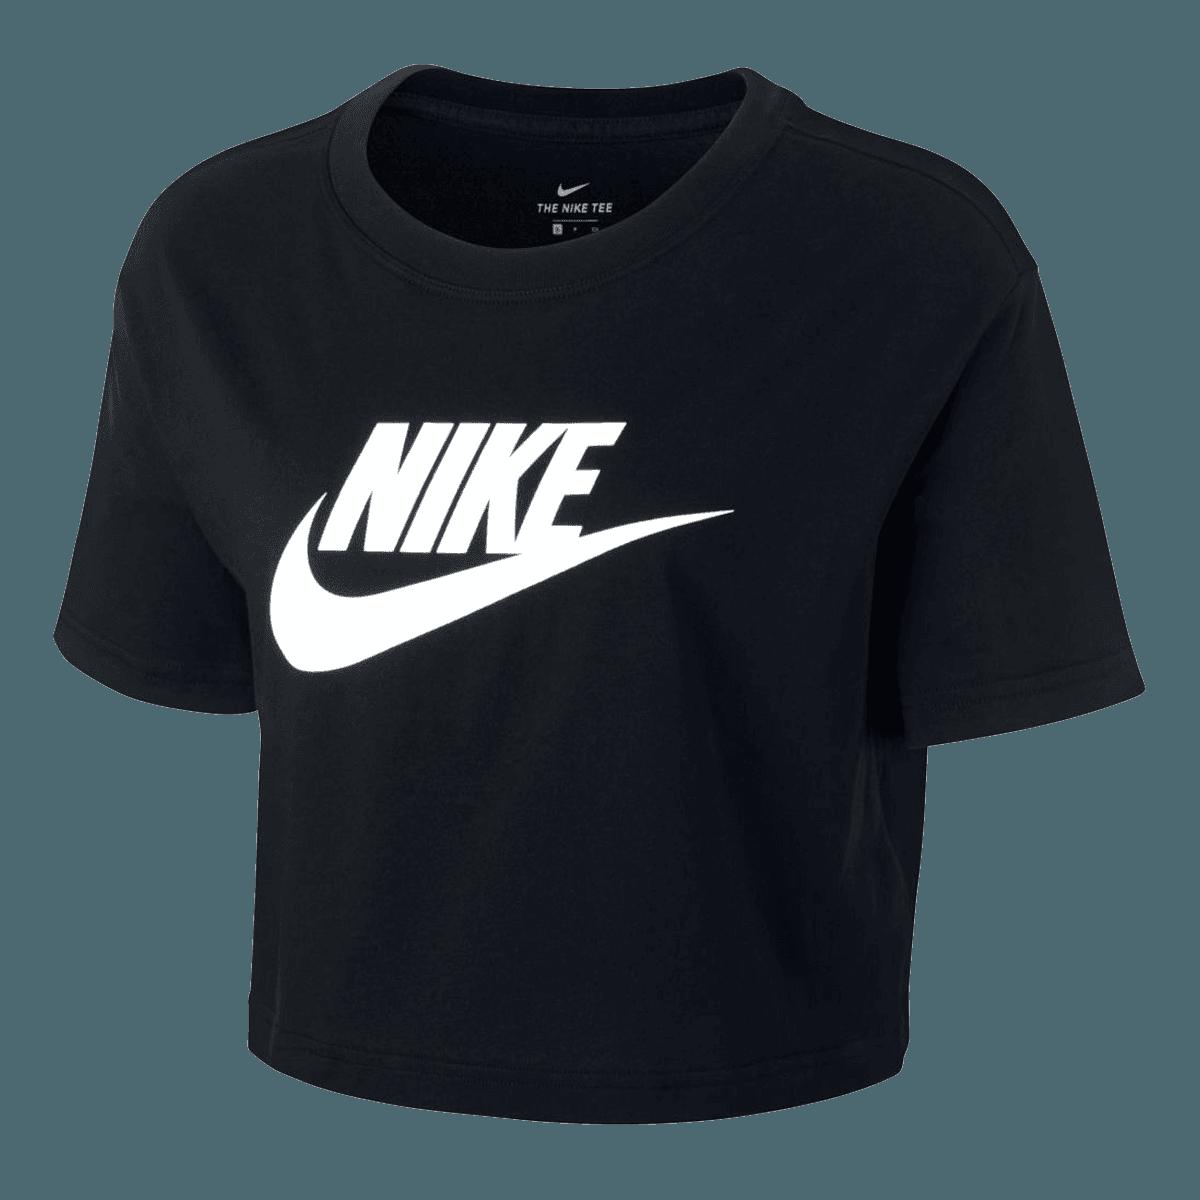 Nike Damen Crop Top Sportswear Essential ICN FTR schwarzweiß